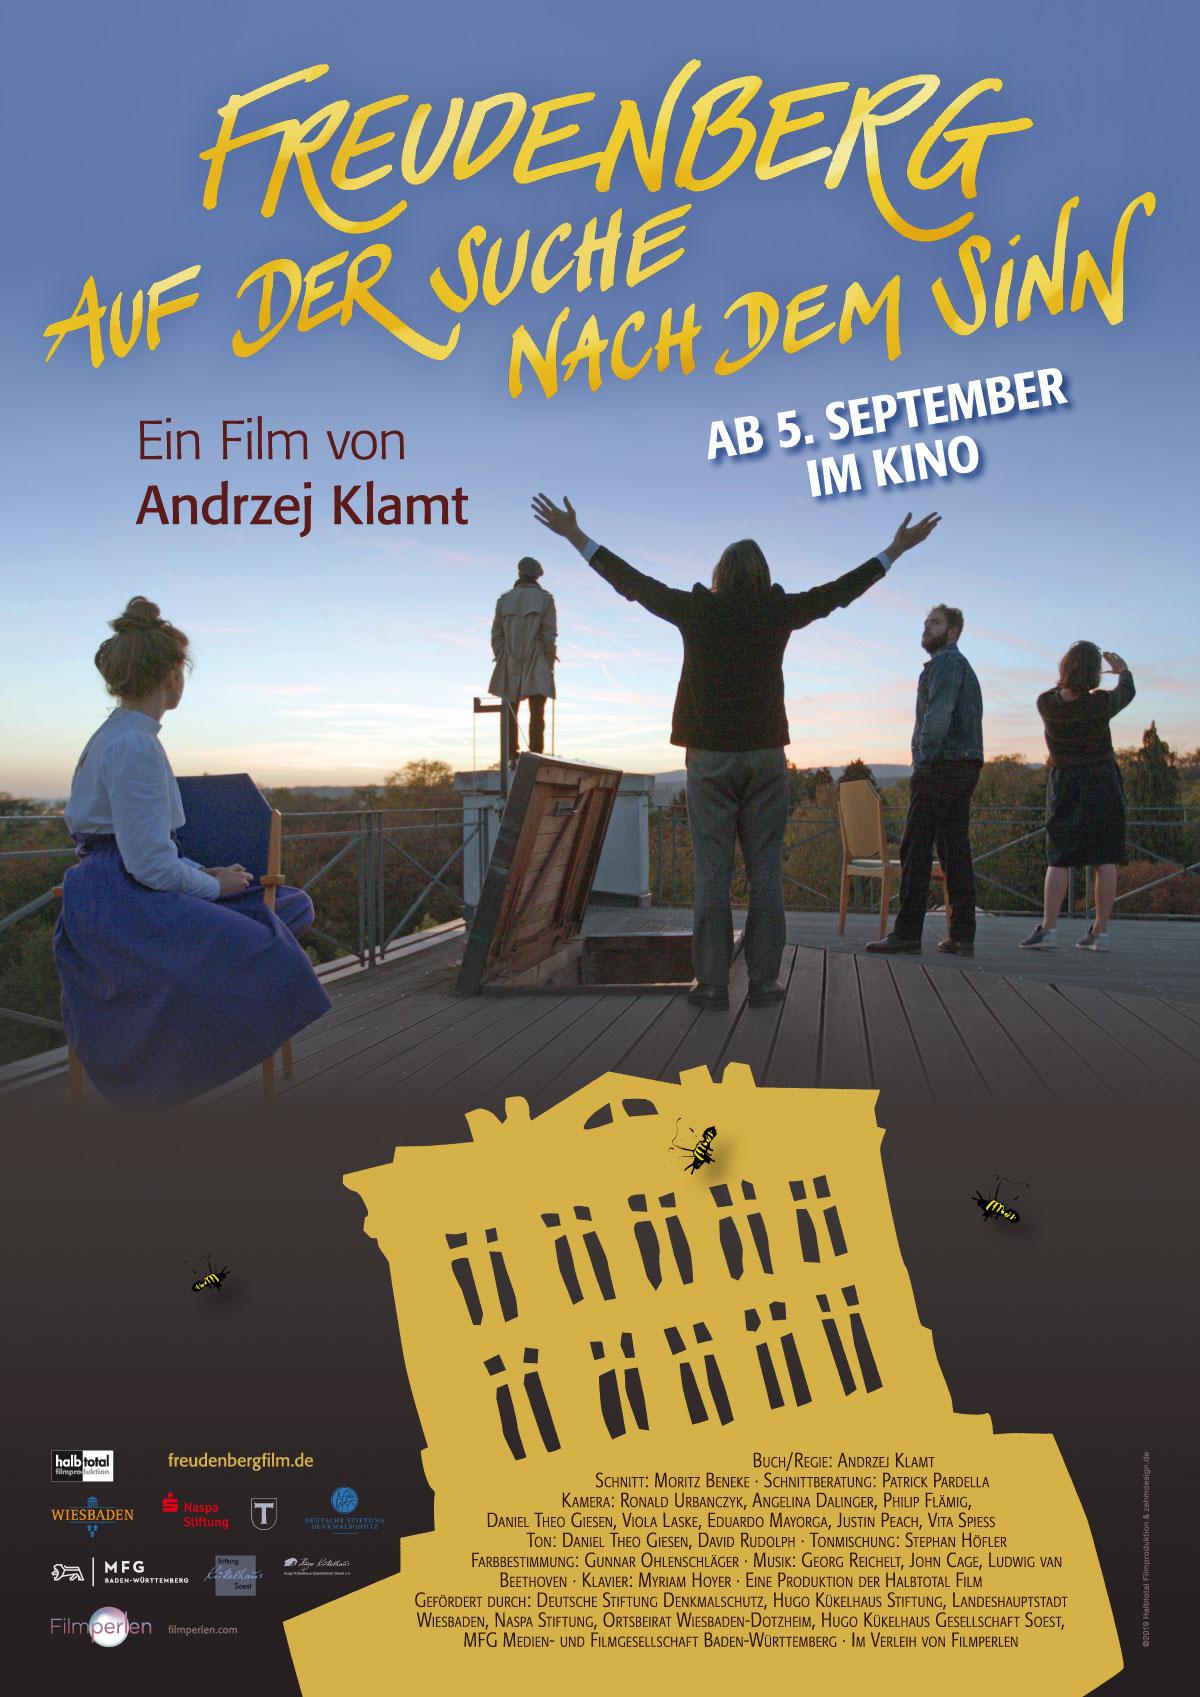 Freudenberg Filmplakat